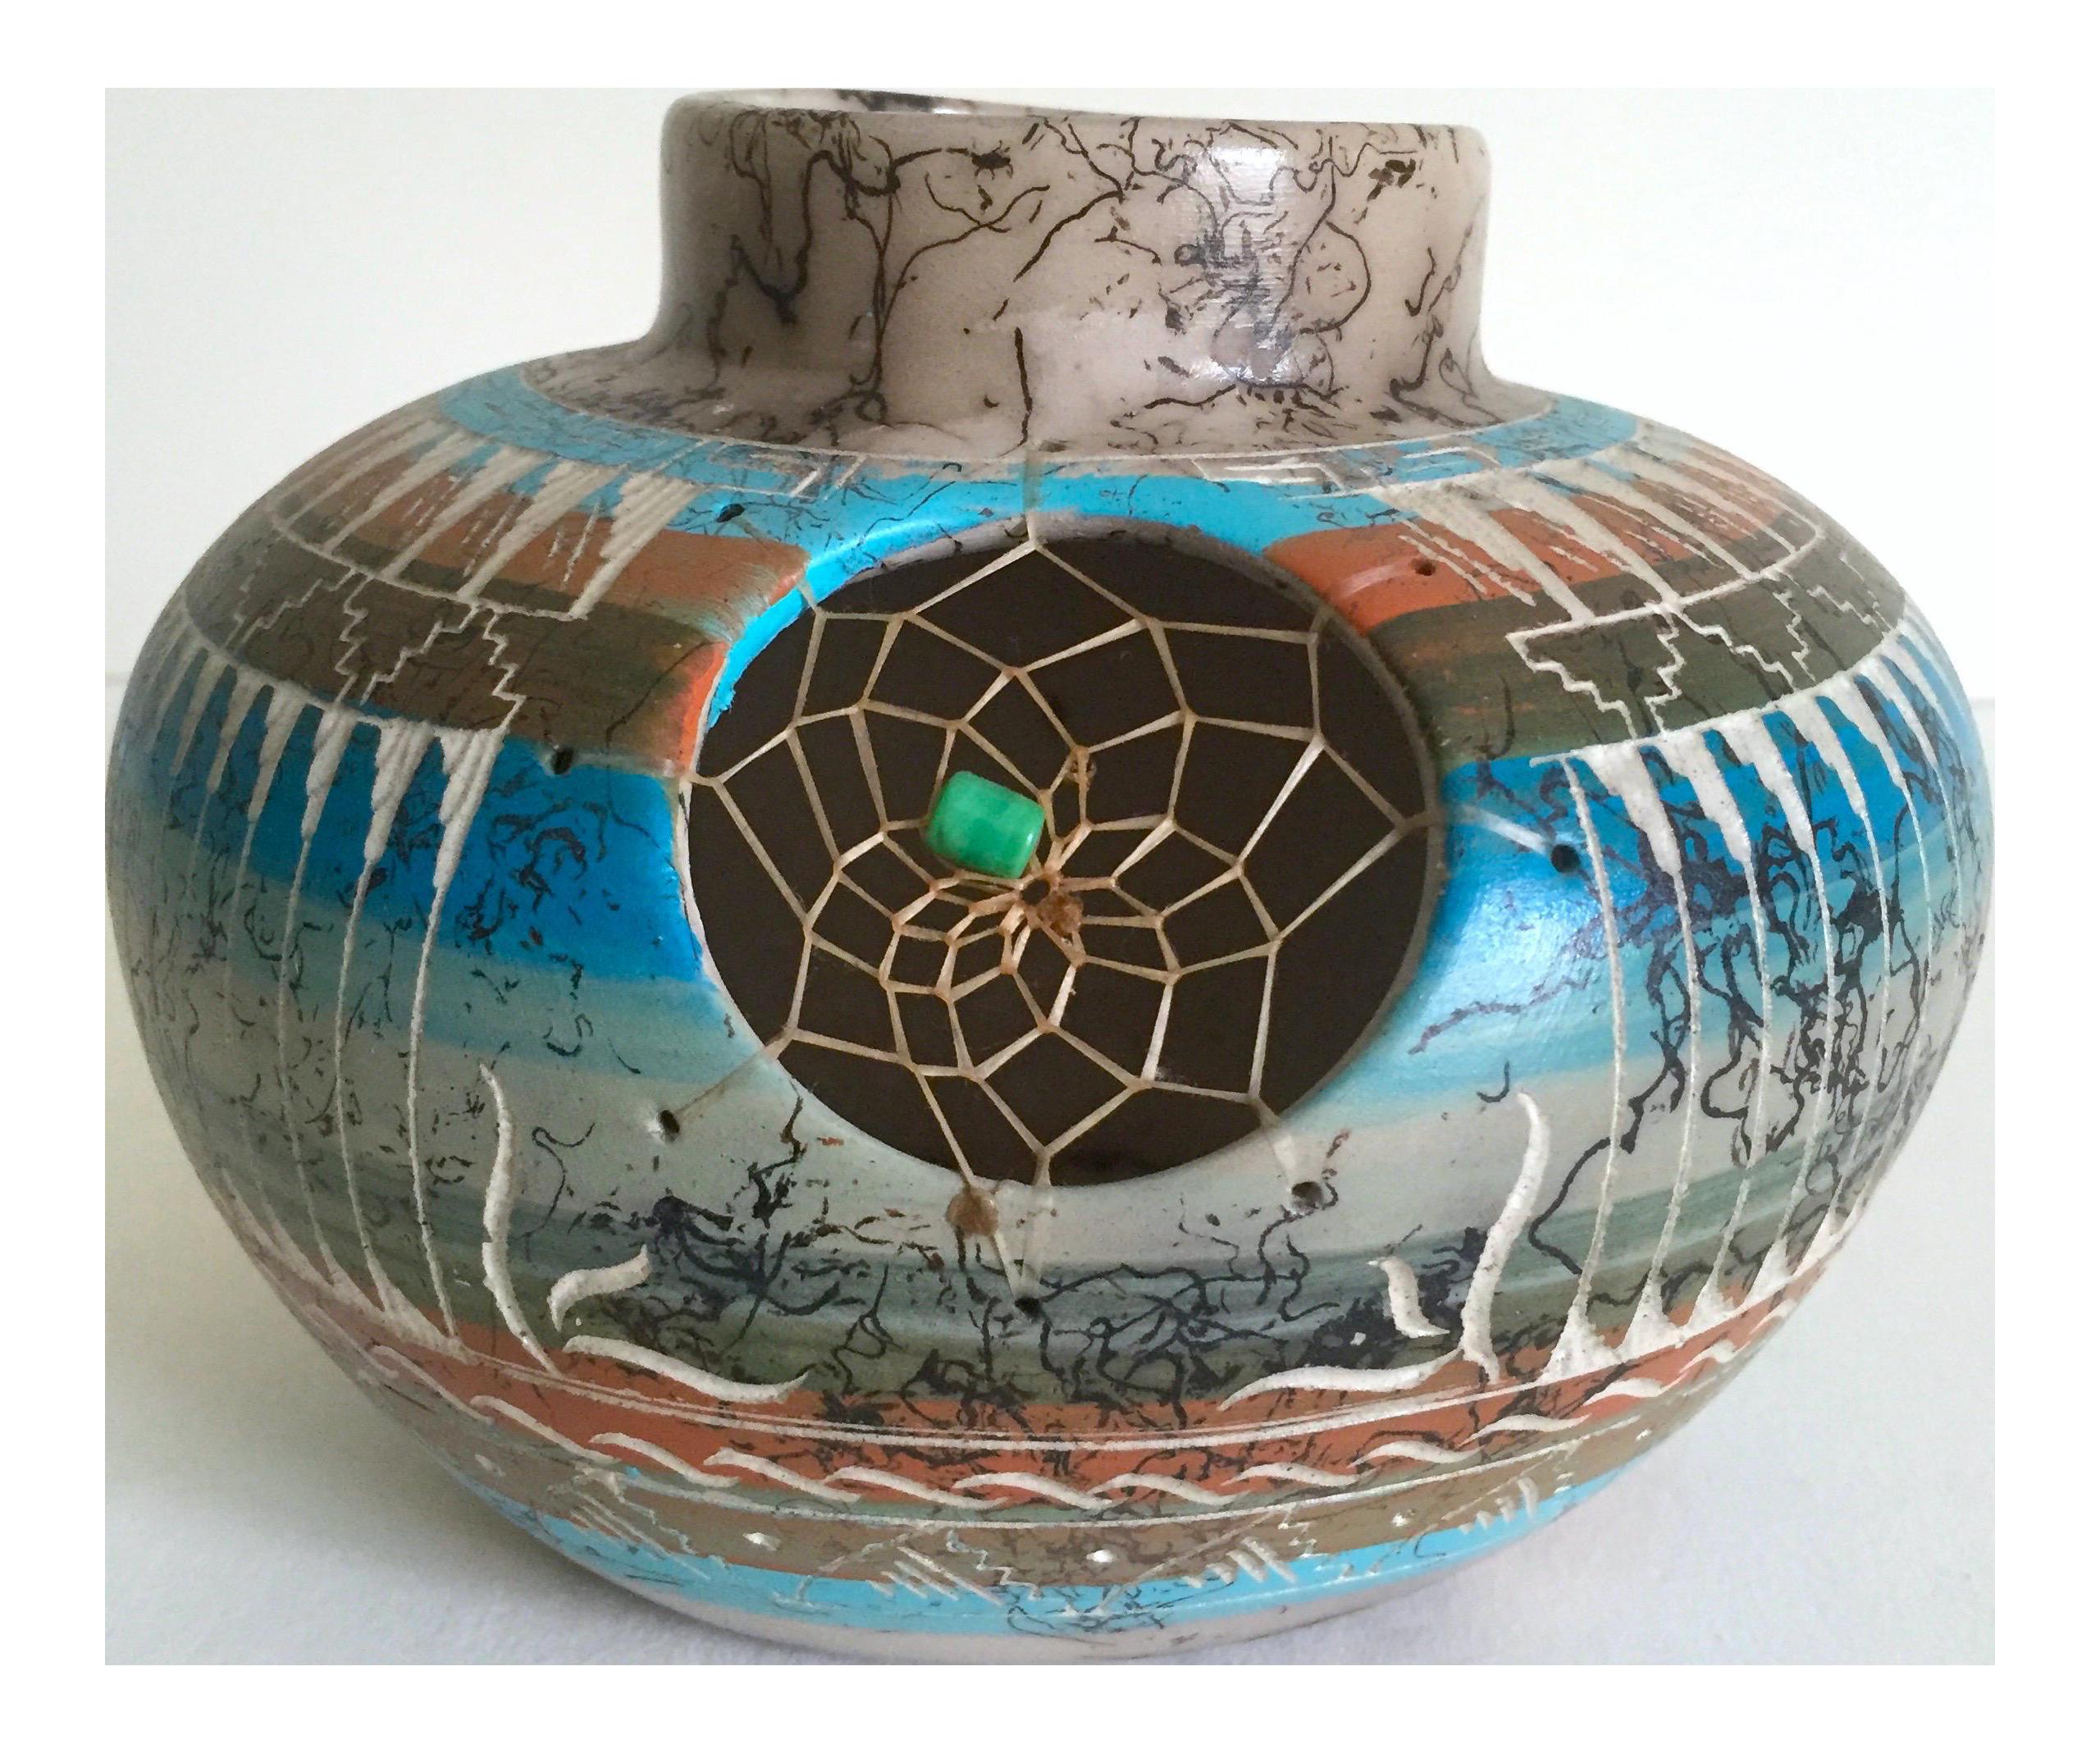 Vintage Navajo Native American Mystic Dreamcatcher Pottery Vessel